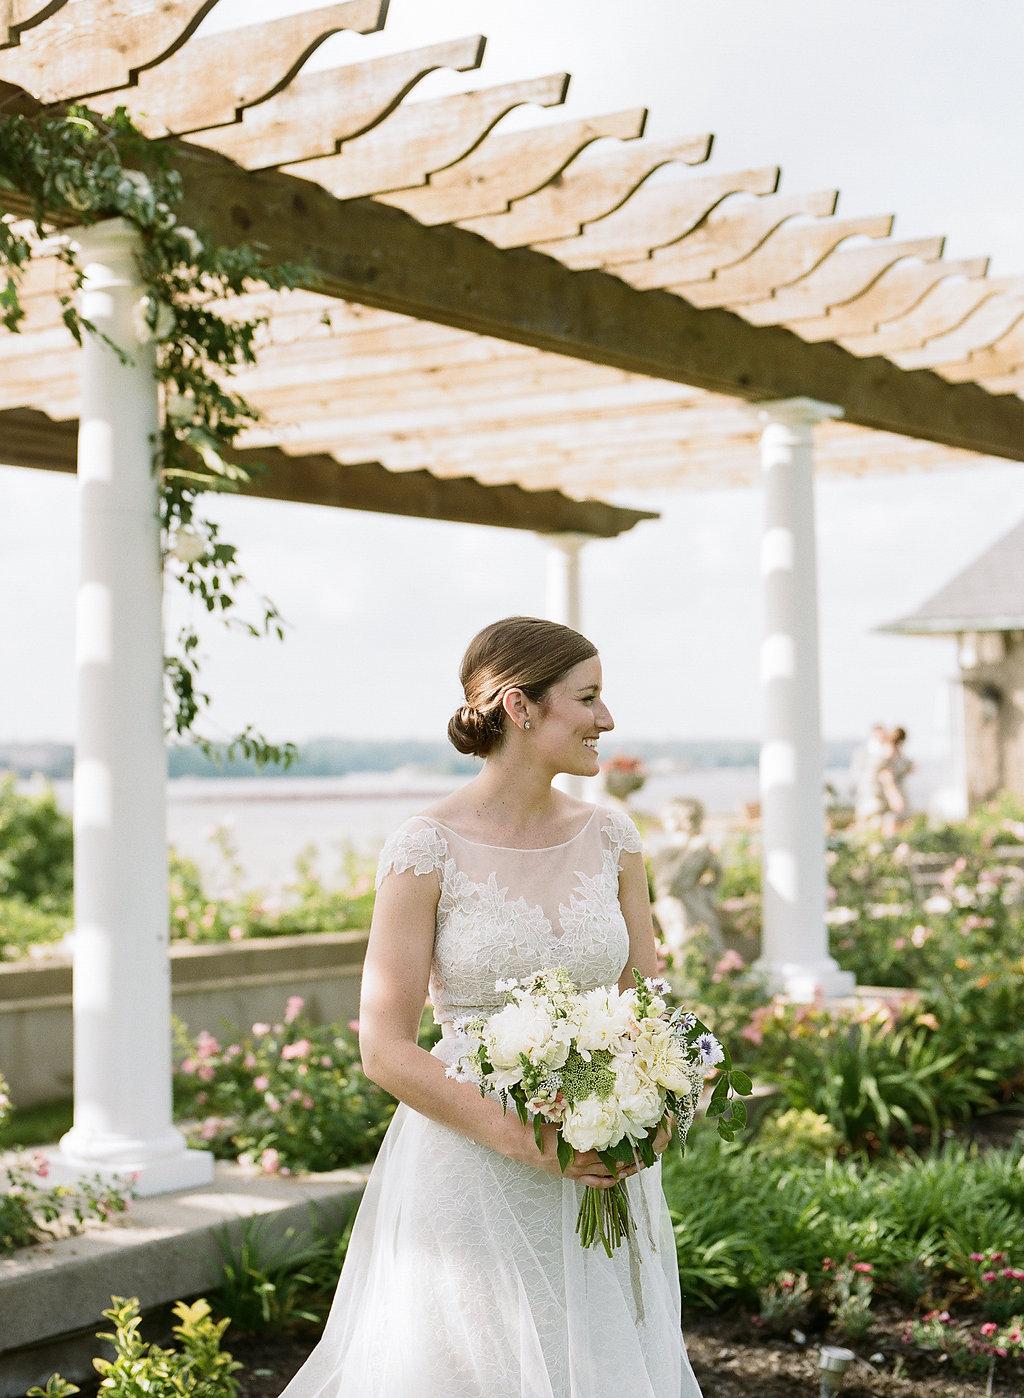 09_Bride-9.jpg